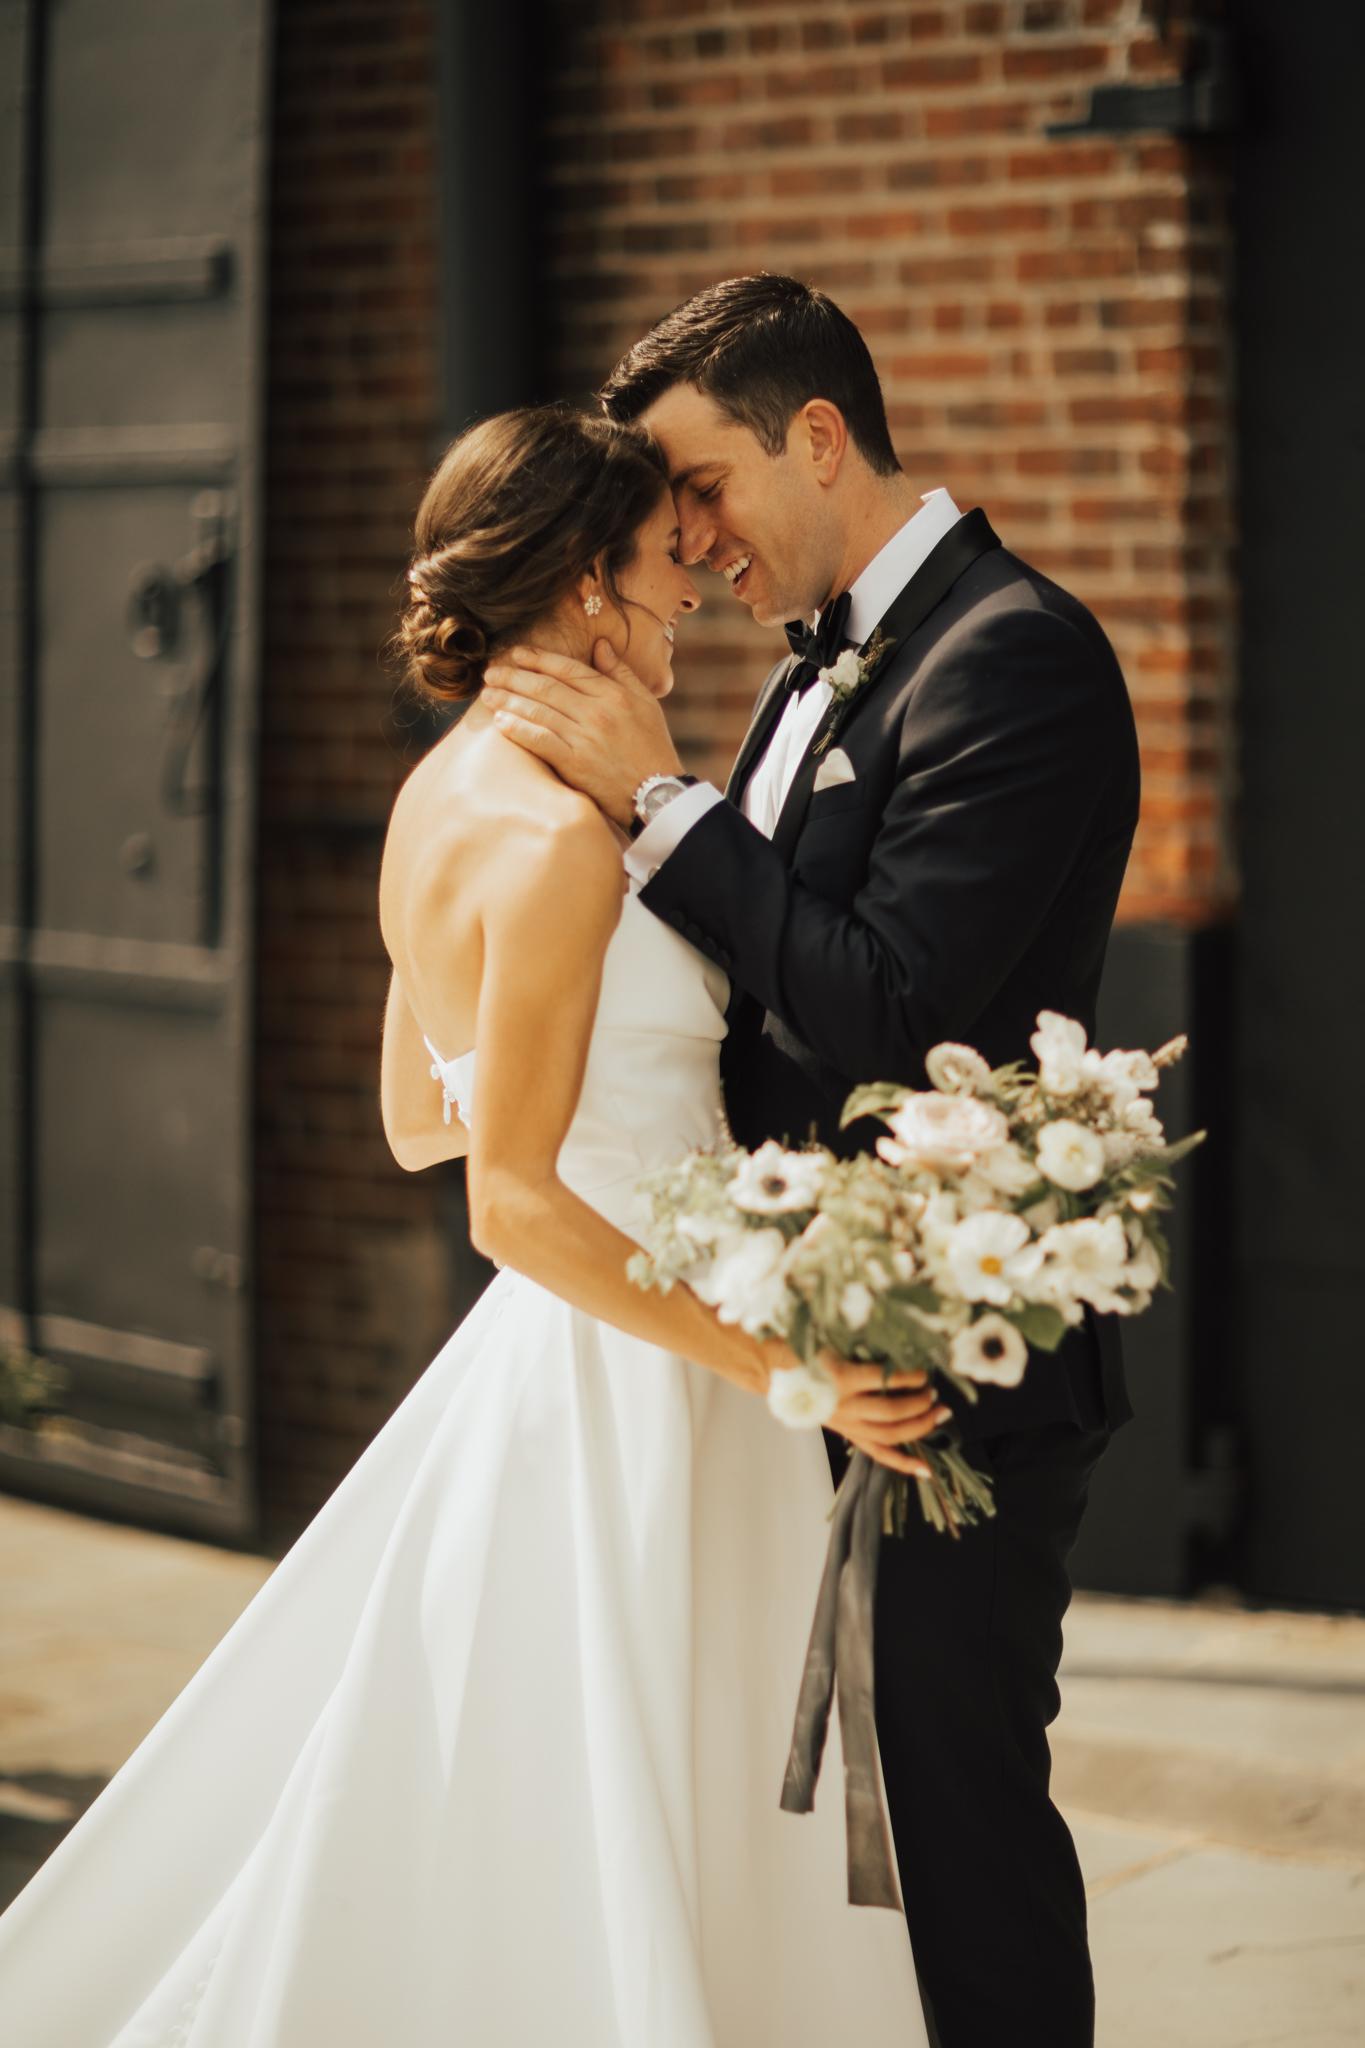 liberty_warehouse_wedding-58.jpg